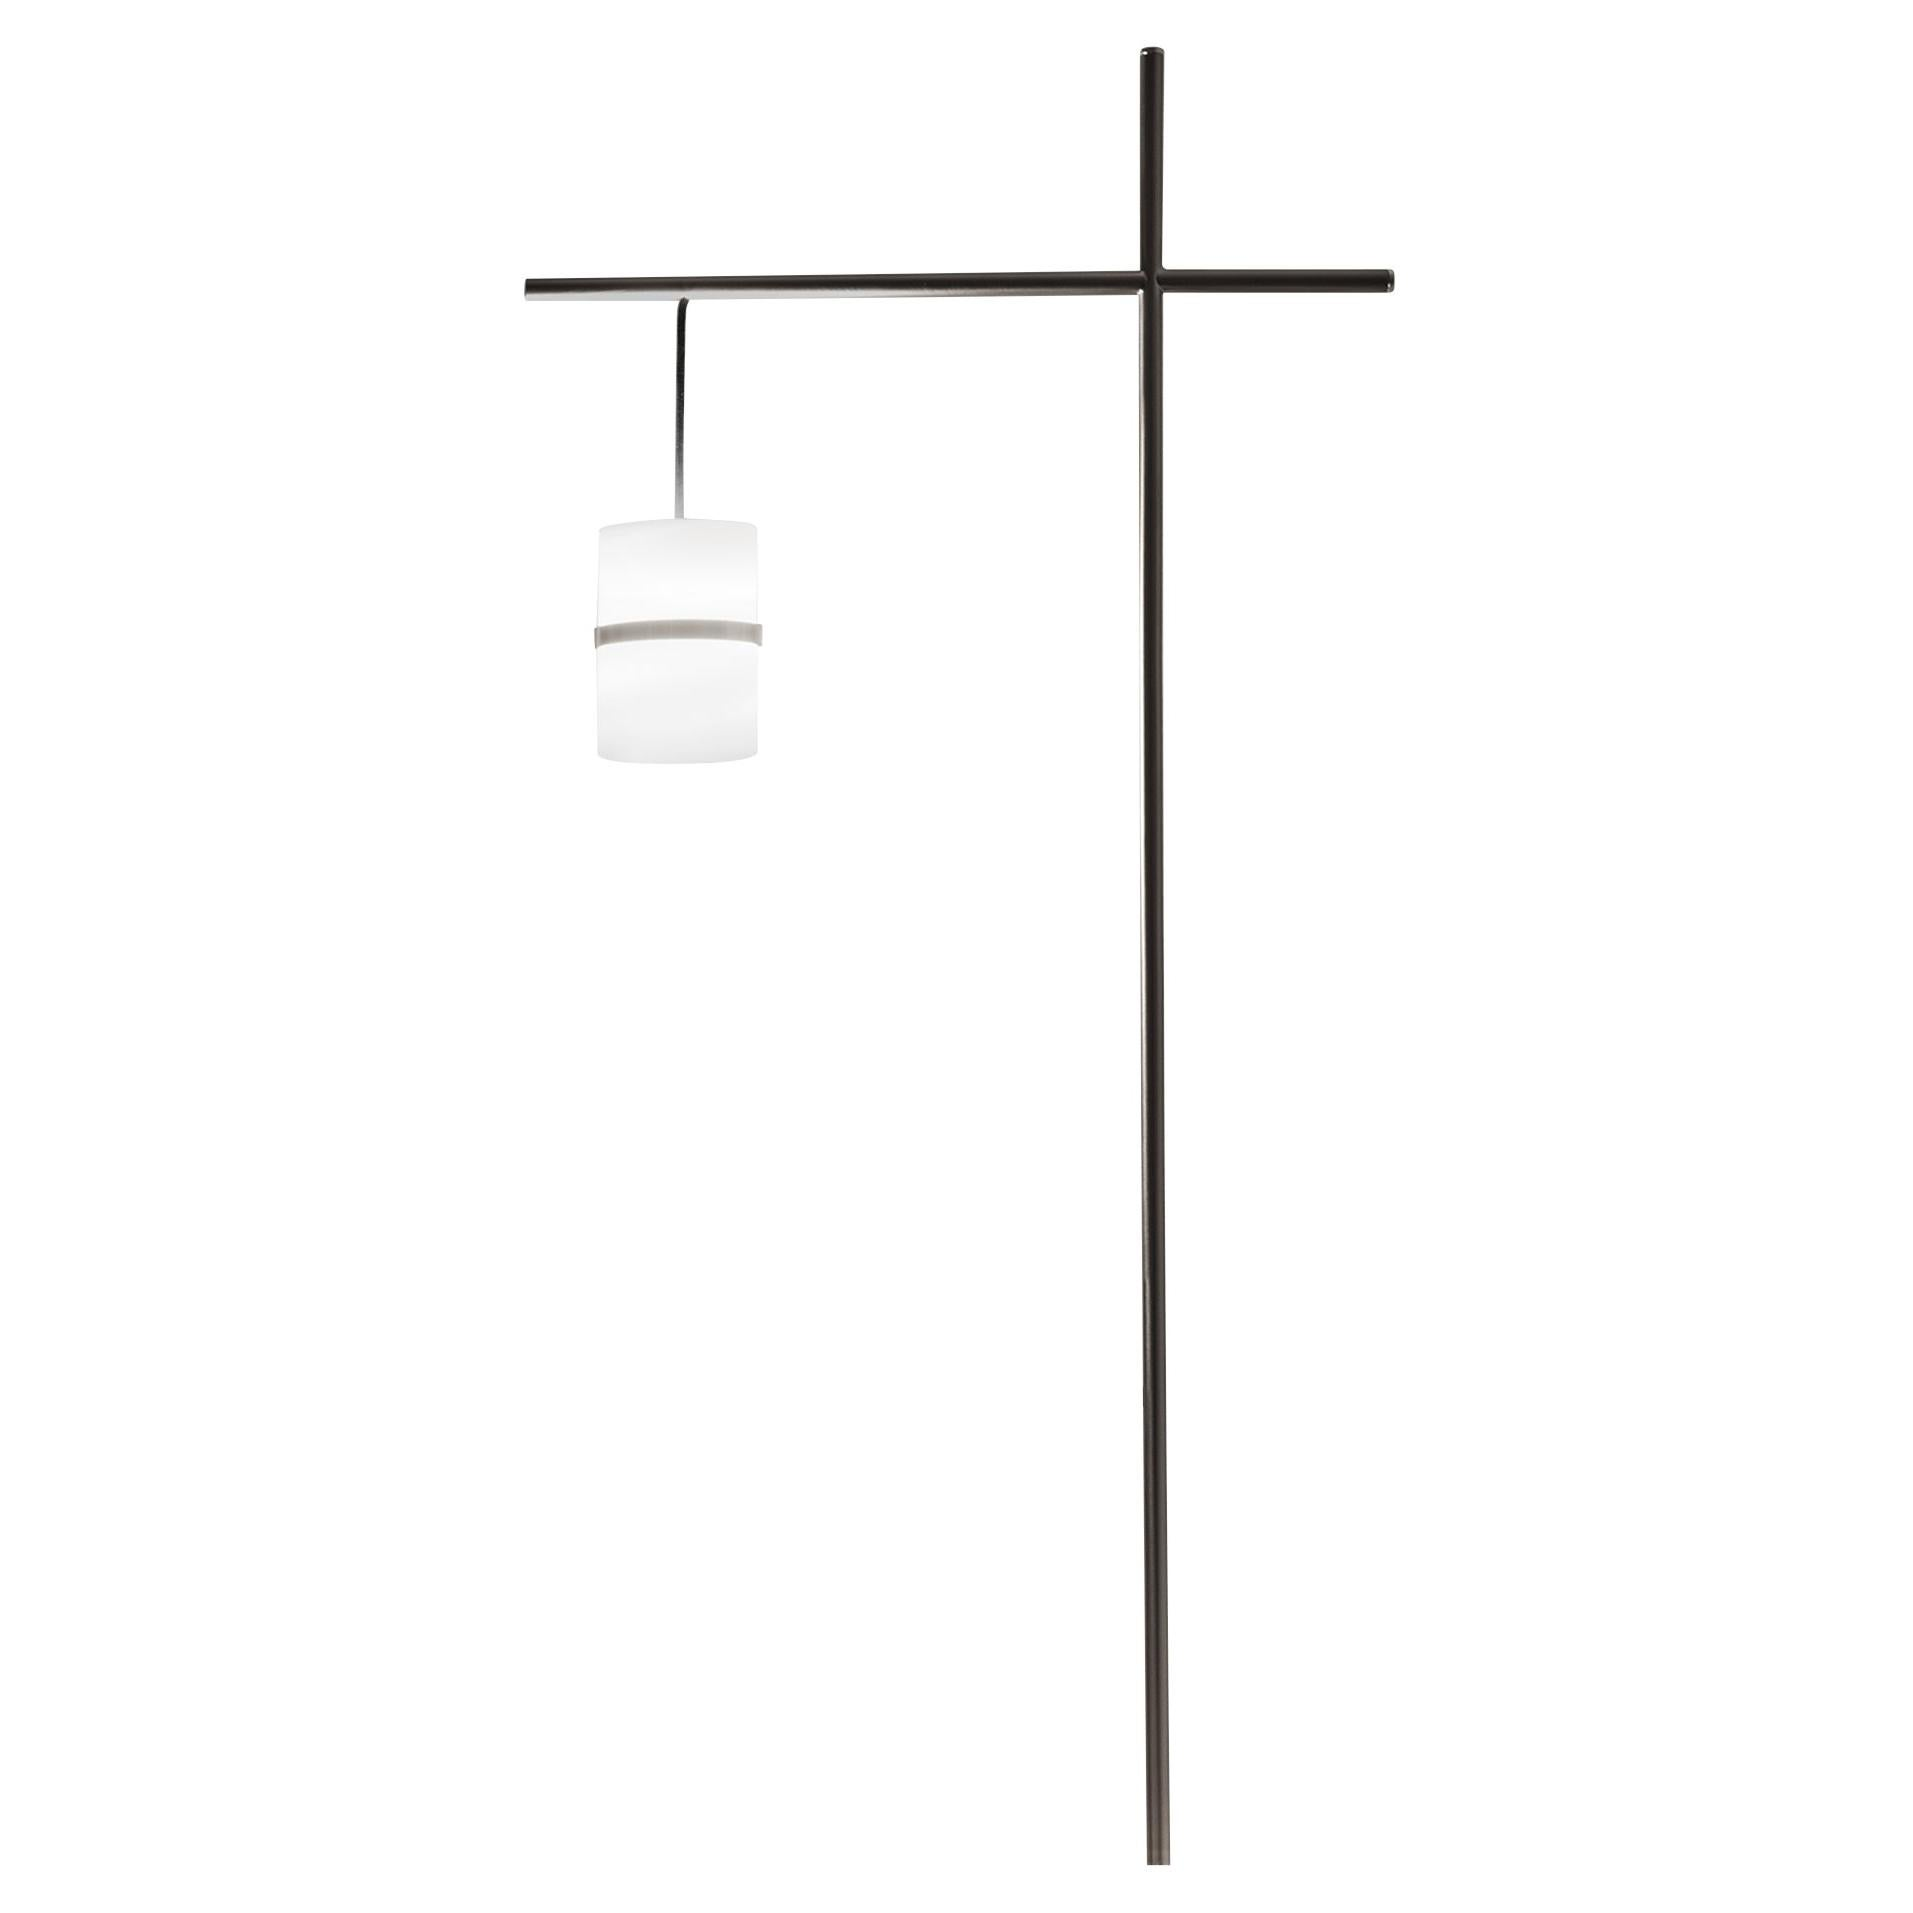 Firmamento Milano Piccola Boa Lecture Floor Lamp in Nickel by Carlo Guglielmi